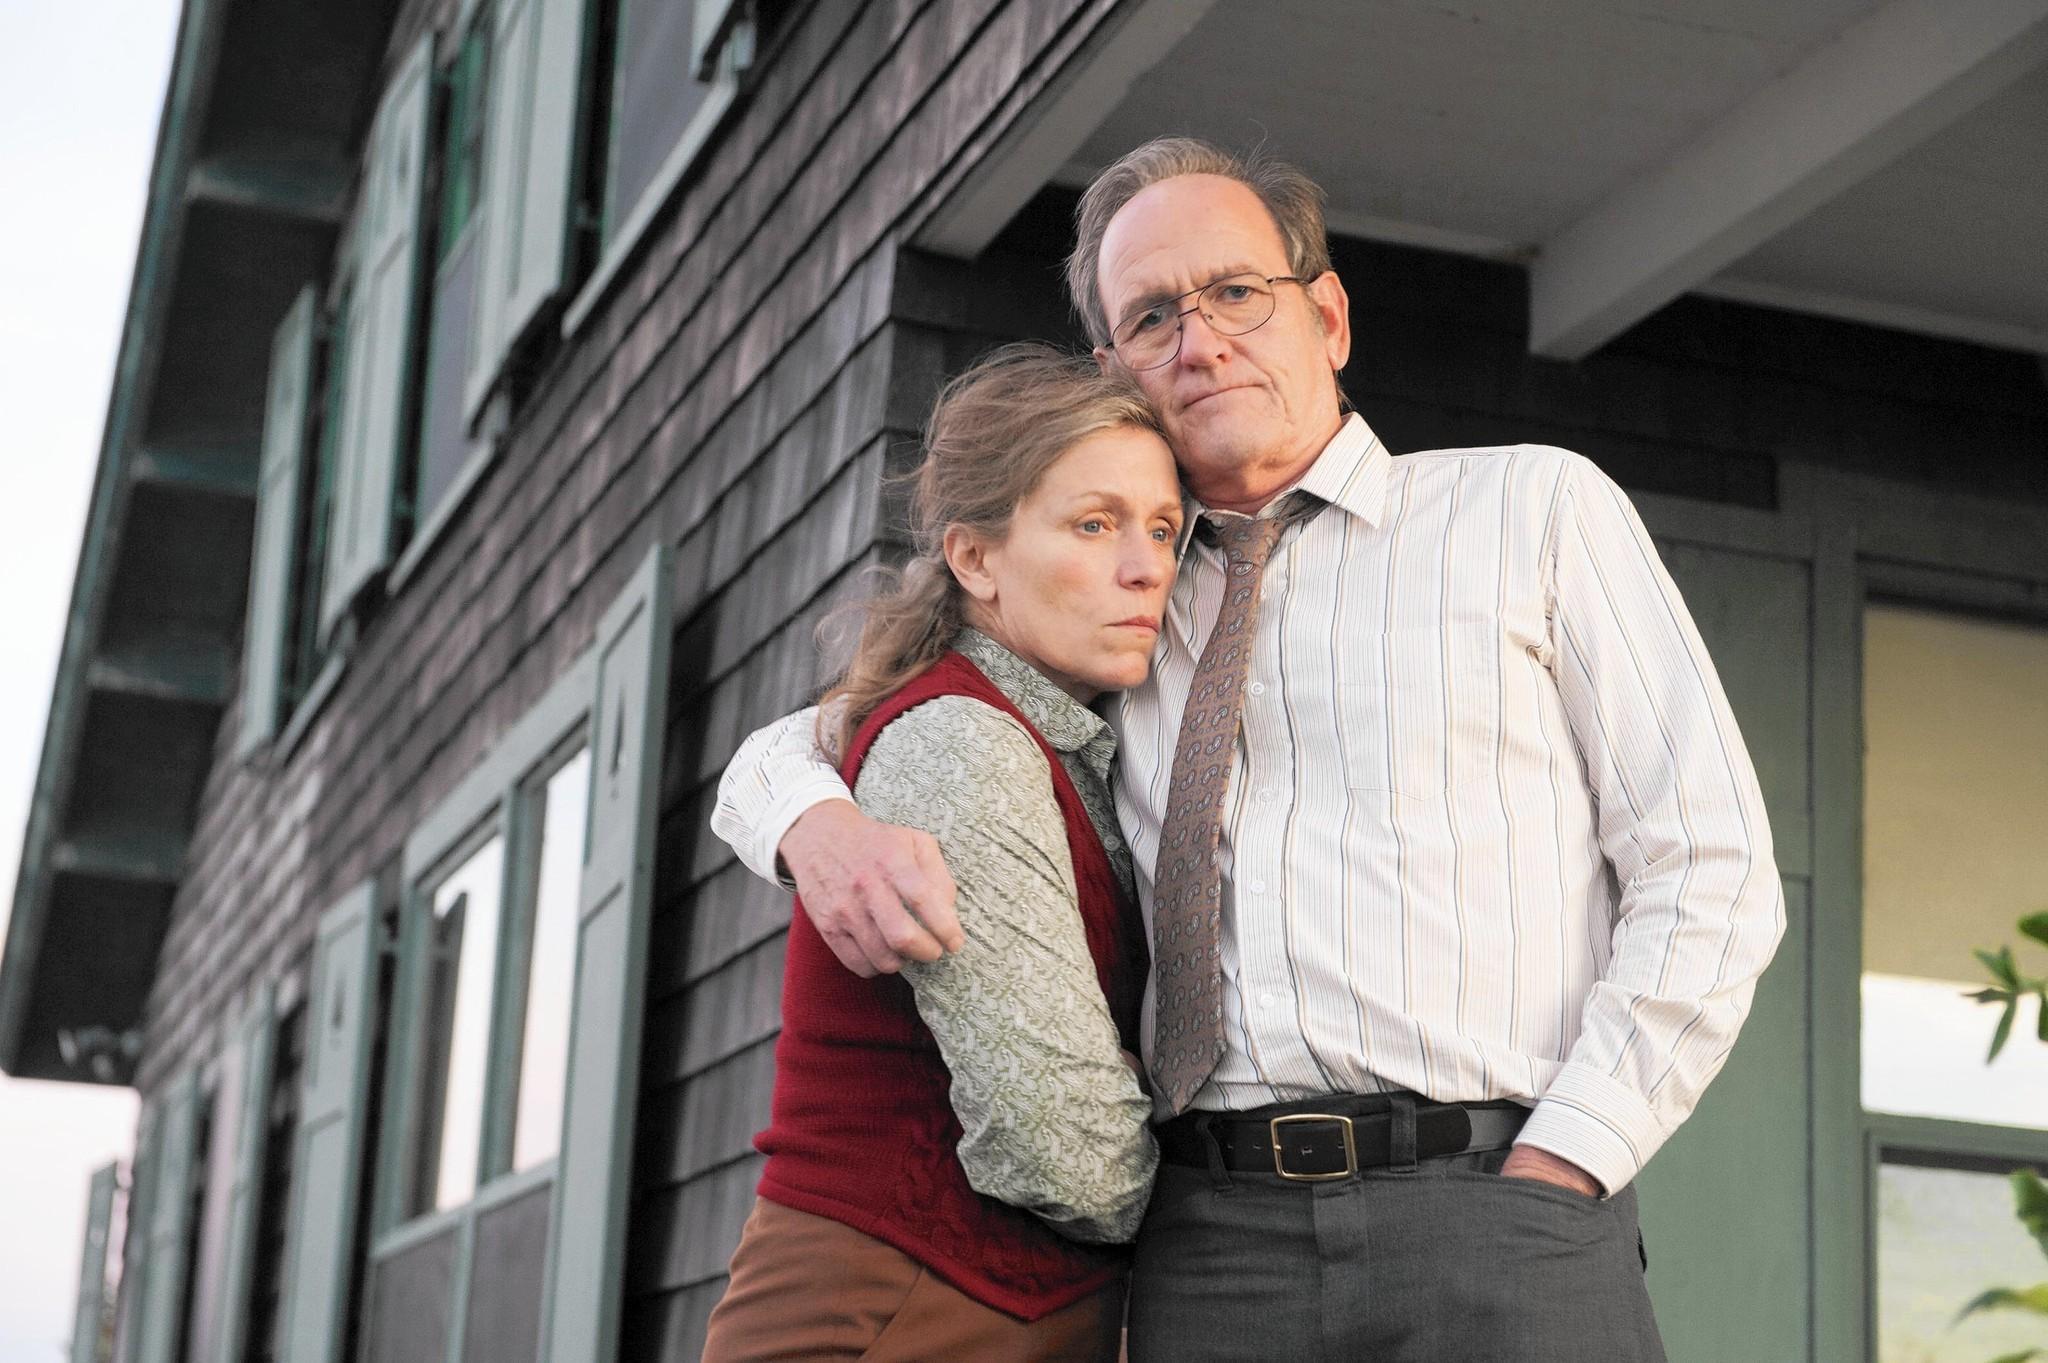 Frances McDormand and Richard Jenkins in